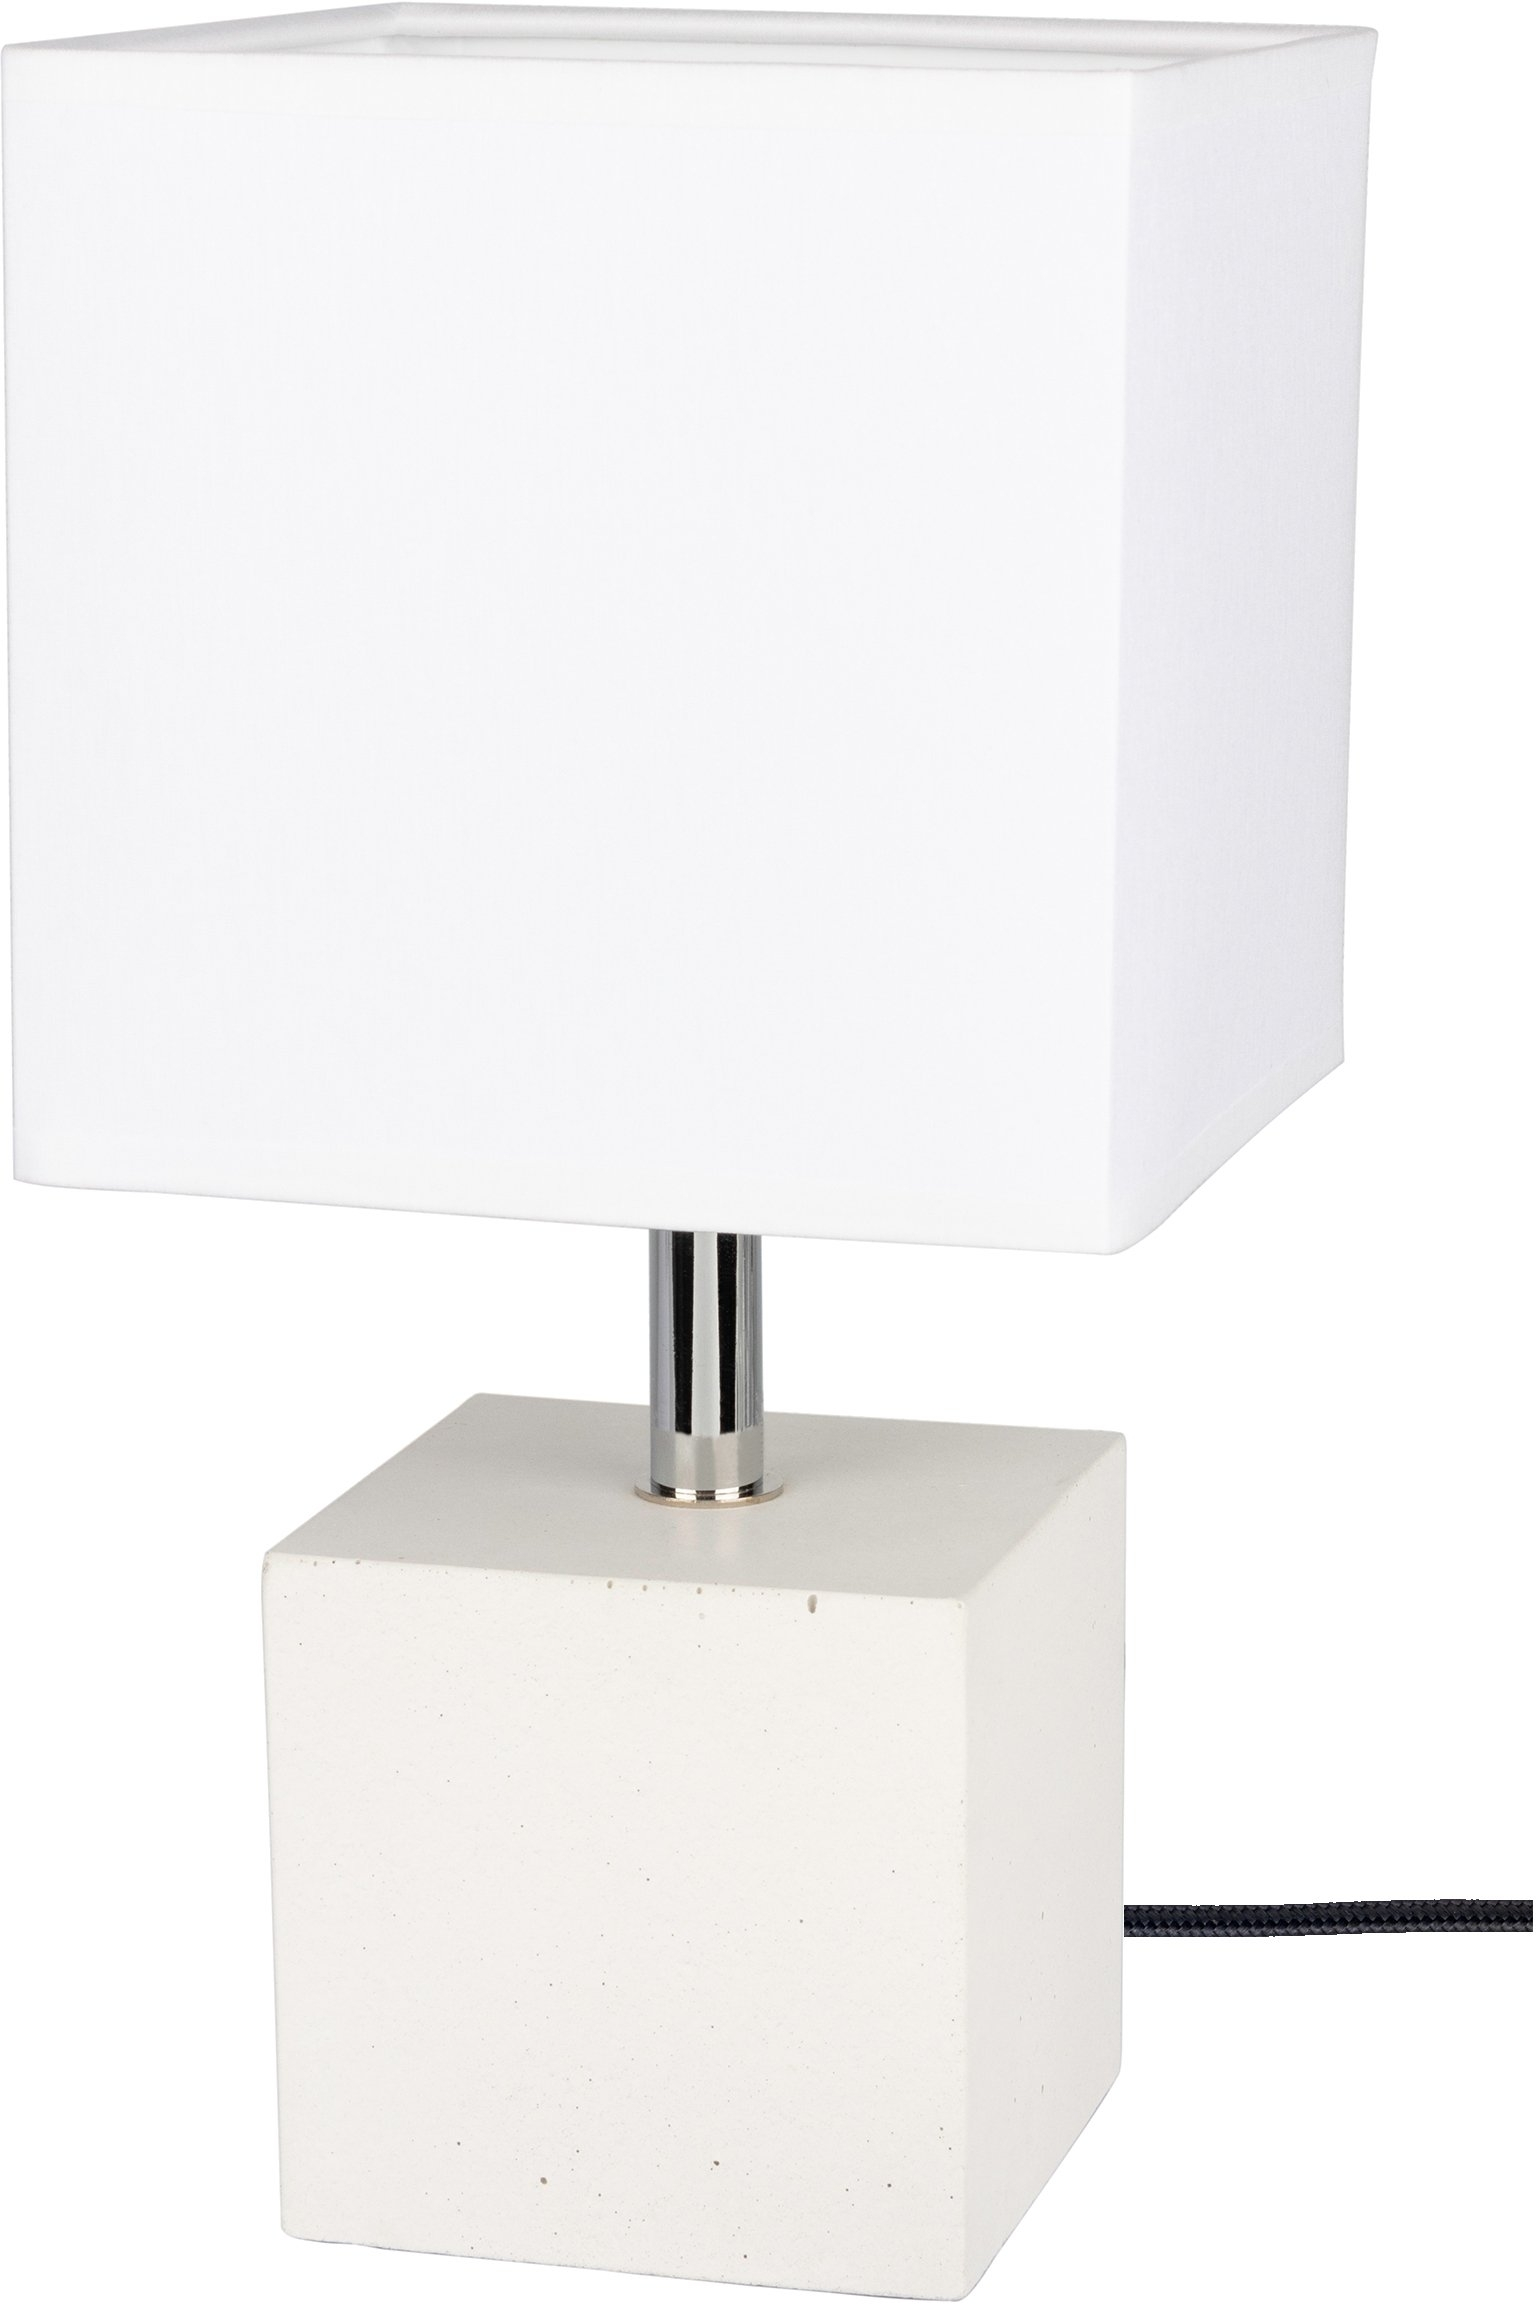 SPOT Light tafellamp STRON | STRONG Basis van wit beton, textielen kap, natuurproduct - duurzaam, Made in EU (1 stuk) bij OTTO online kopen